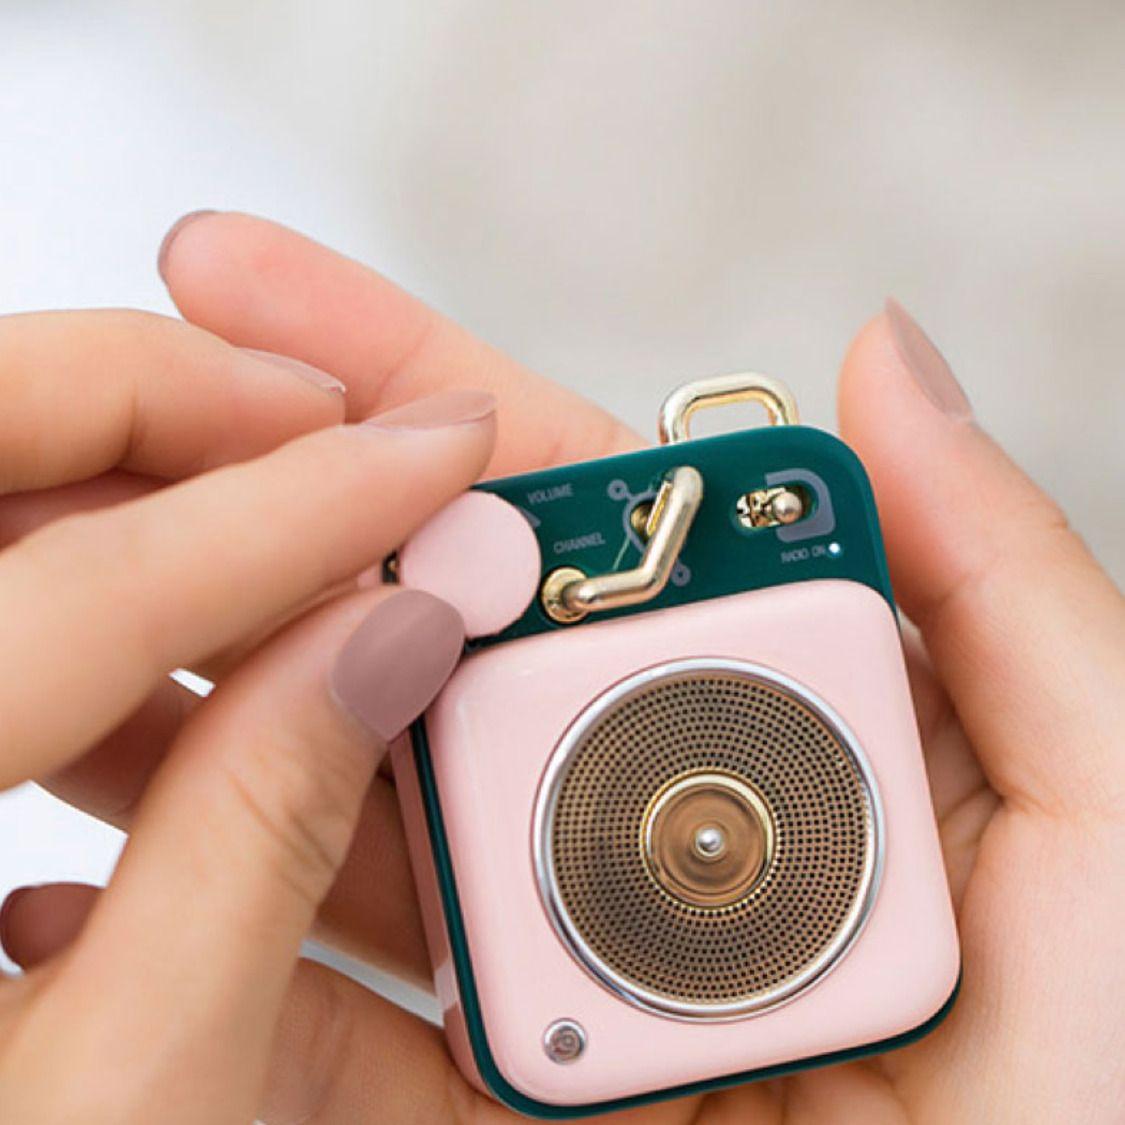 Muzen Atomic Vinyl Player Design Miniature Bluetooth Speaker Vinyl Player Design Vinyl Player Speaker